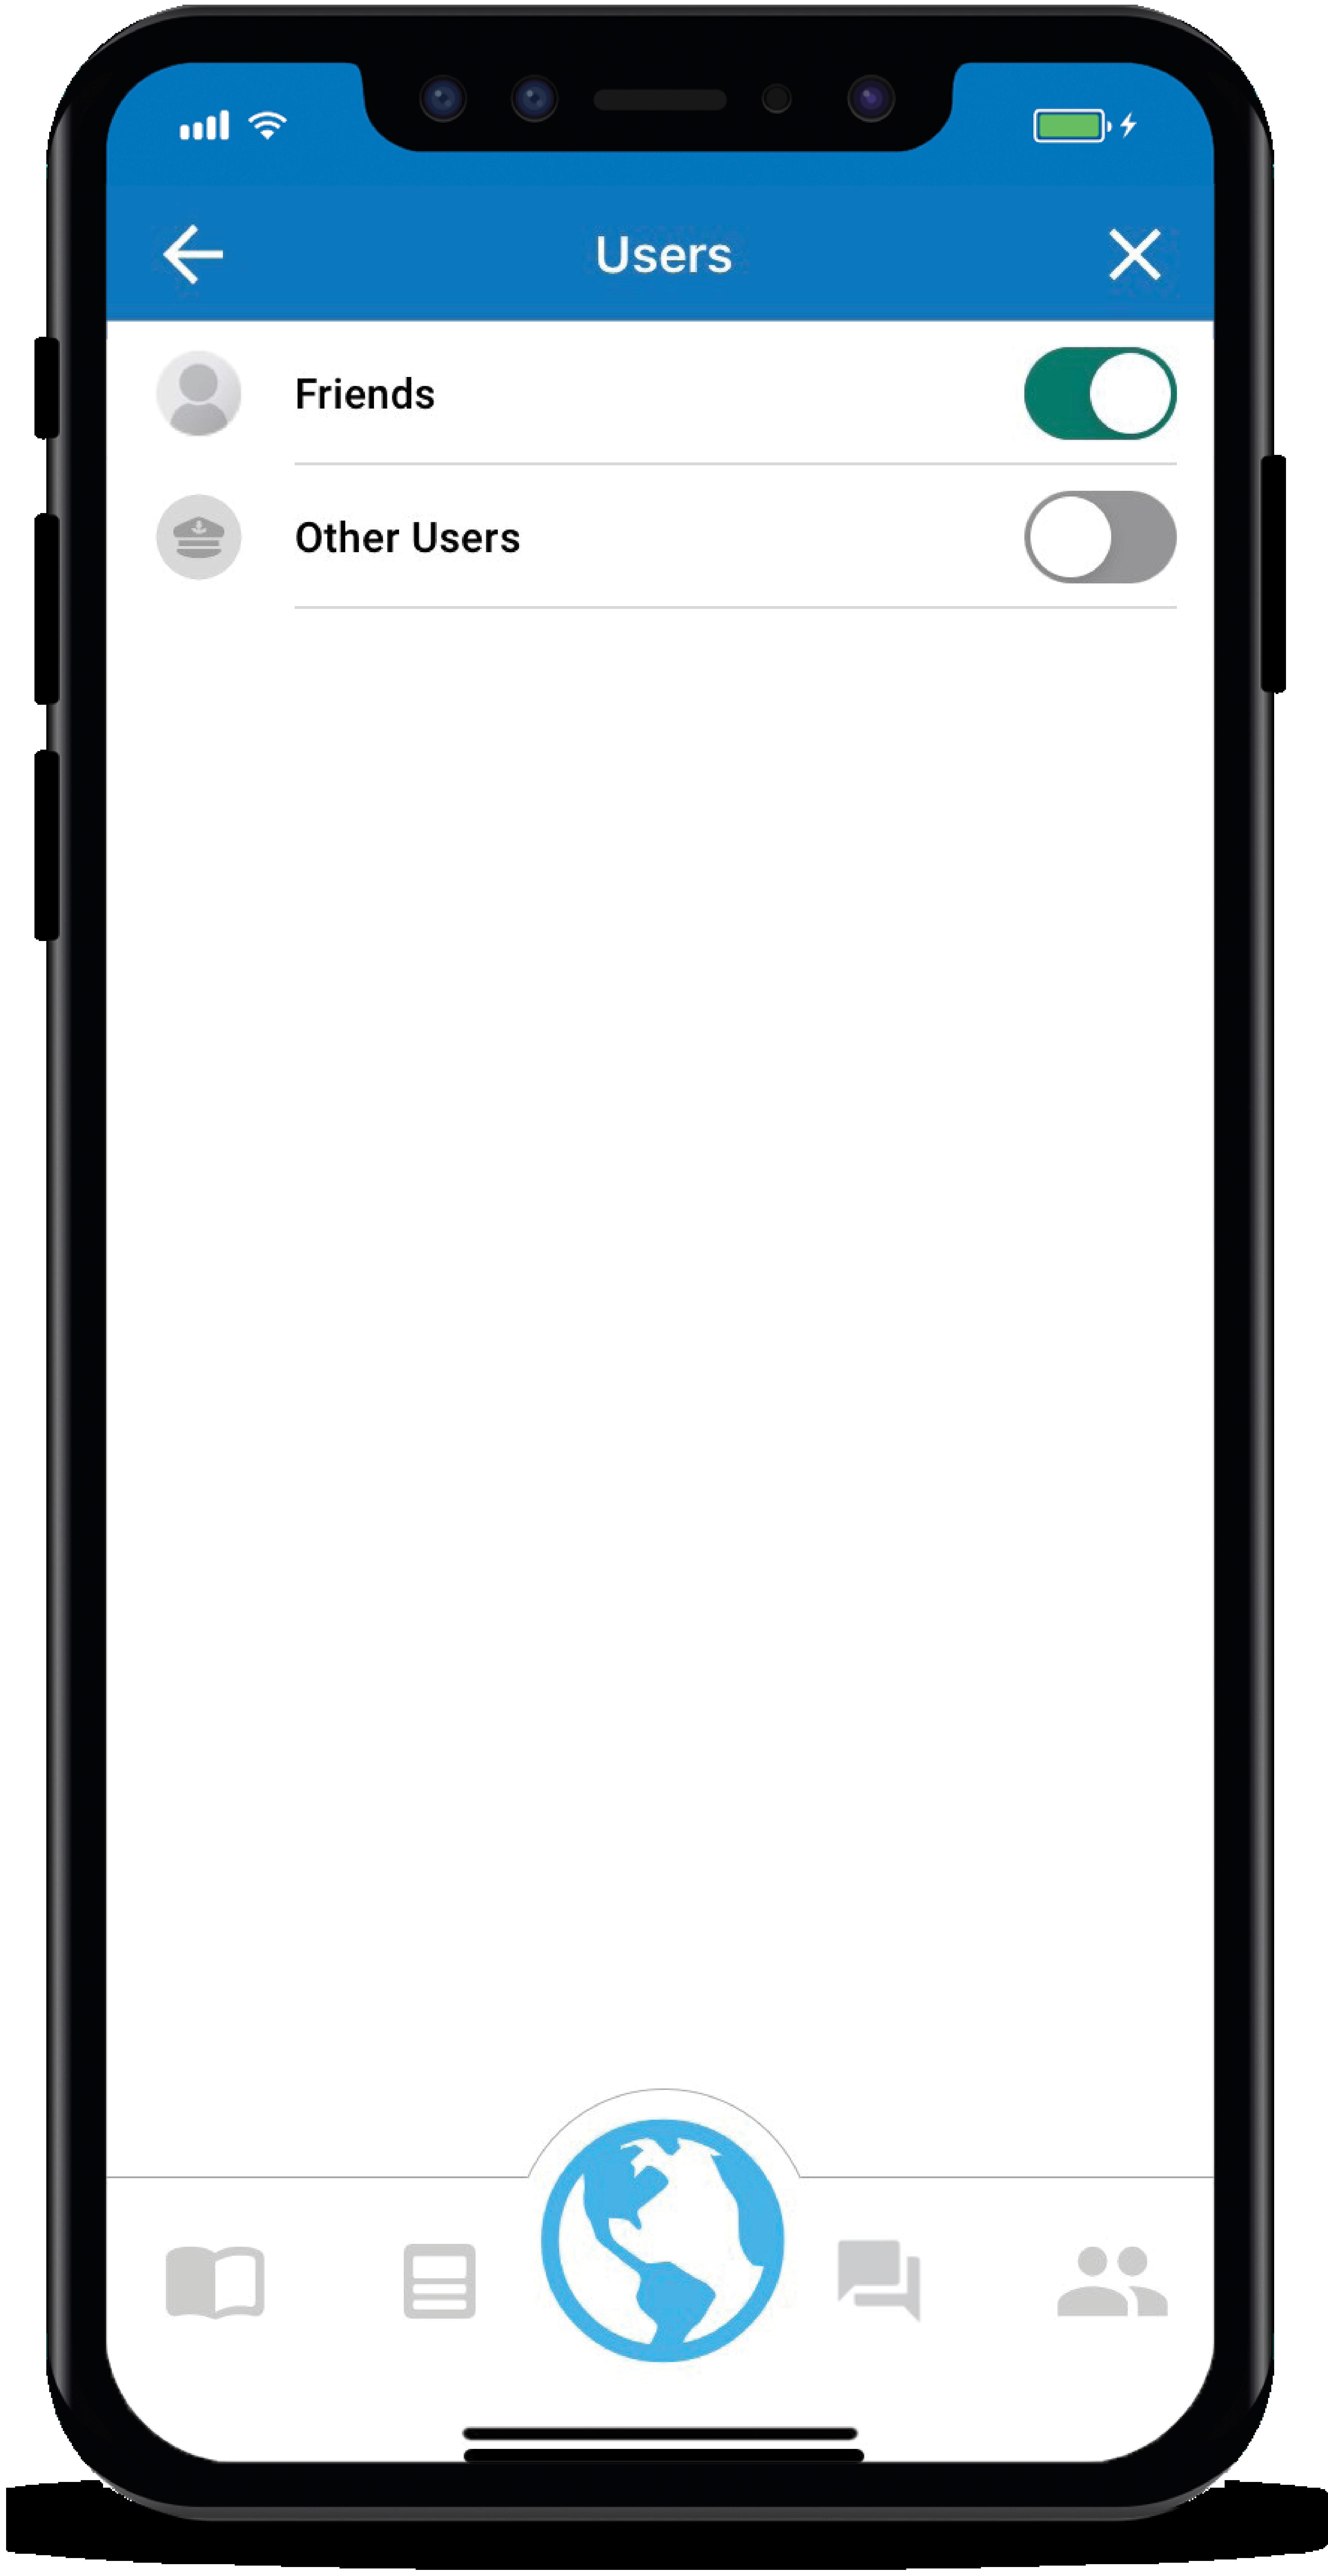 map filter